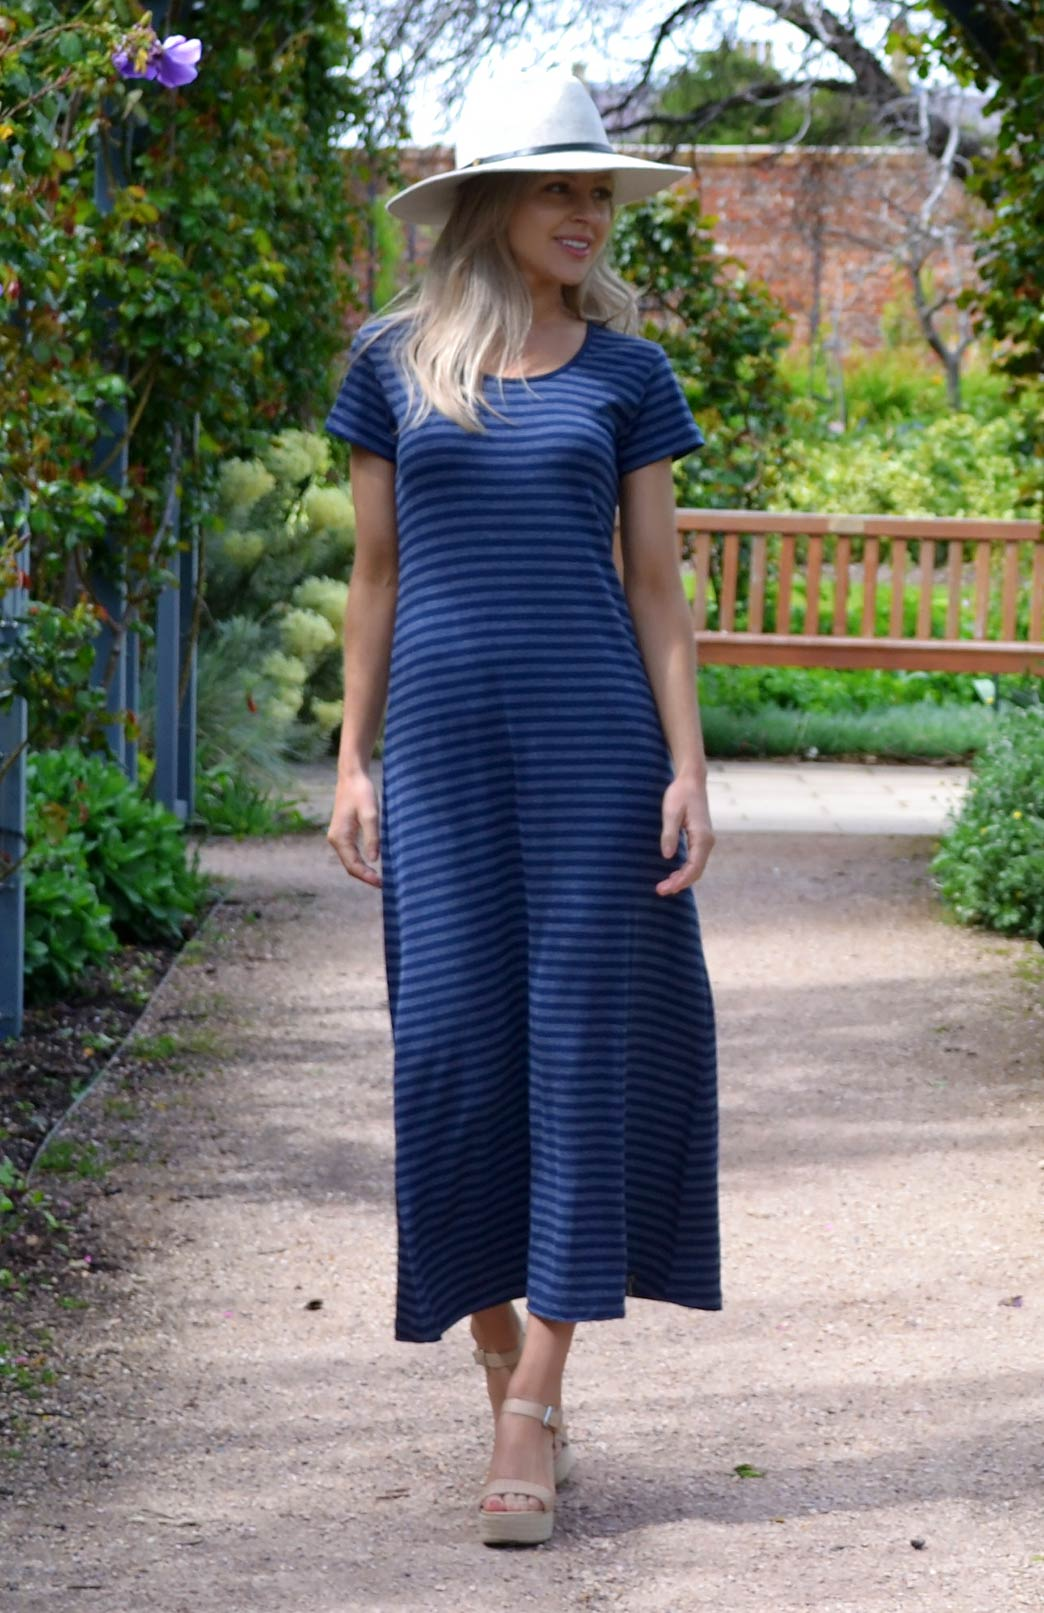 T-Shirt Maxi Dress - Women's Indigo Blue Stripe Merino Wool Modal Blend T-Shirt Maxi Dress - Smitten Merino Tasmania Australia